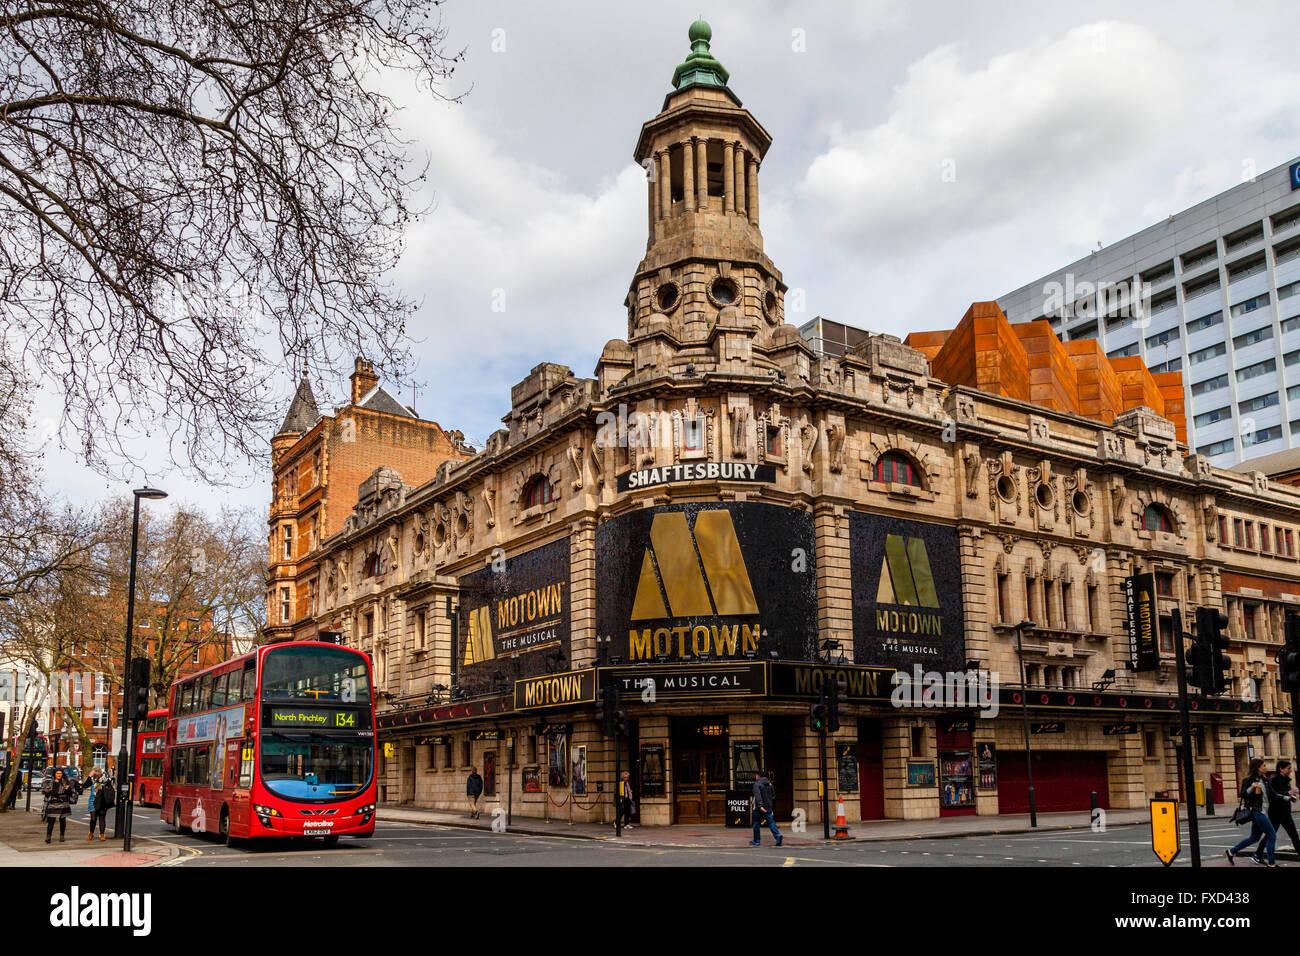 The Shaftesbury Theatre, Shaftesbury Avenue, London, England - Stock Image